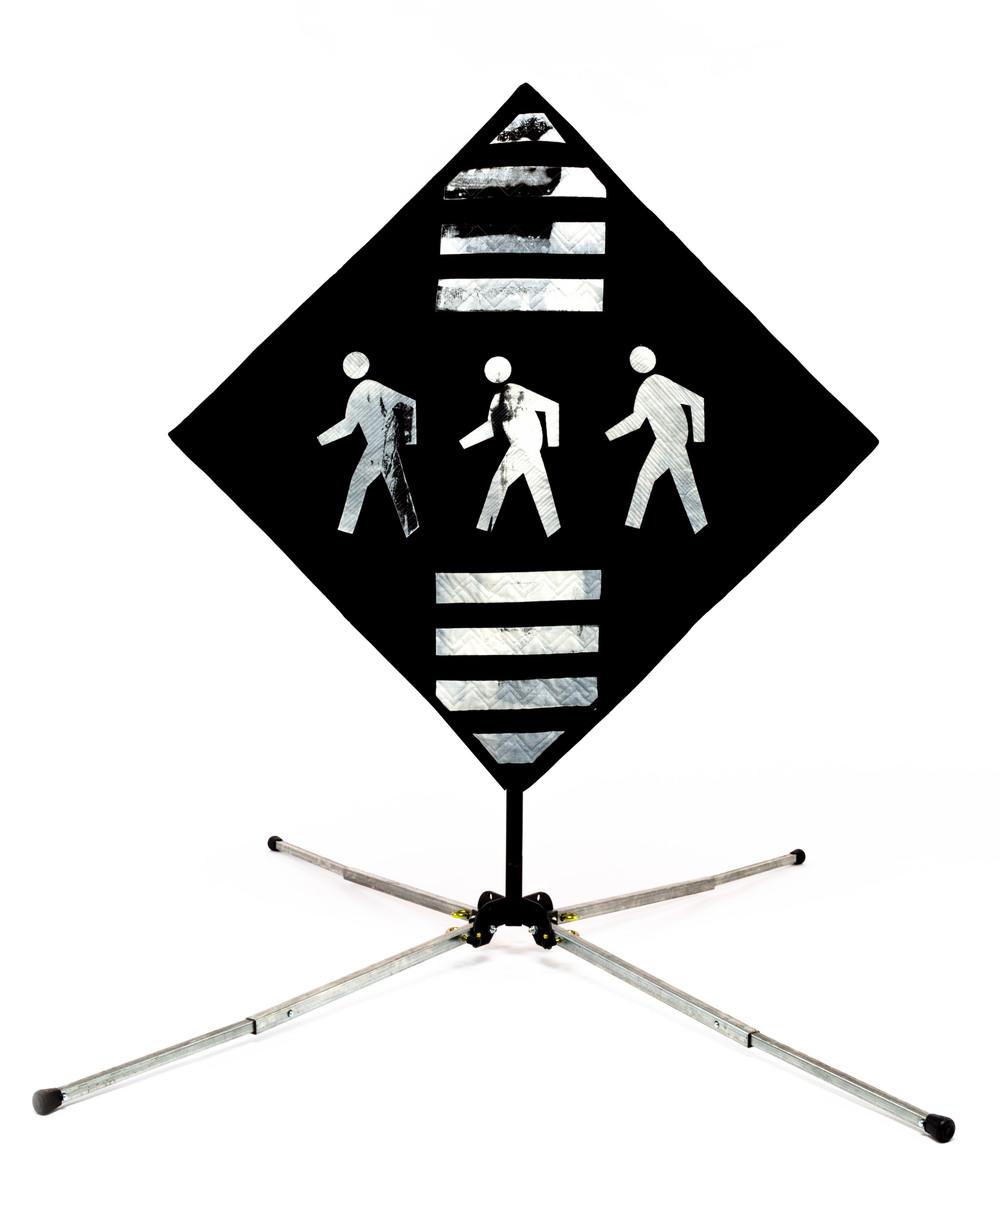 20130117-Hixson_Road_Sign-9334_B.jpg